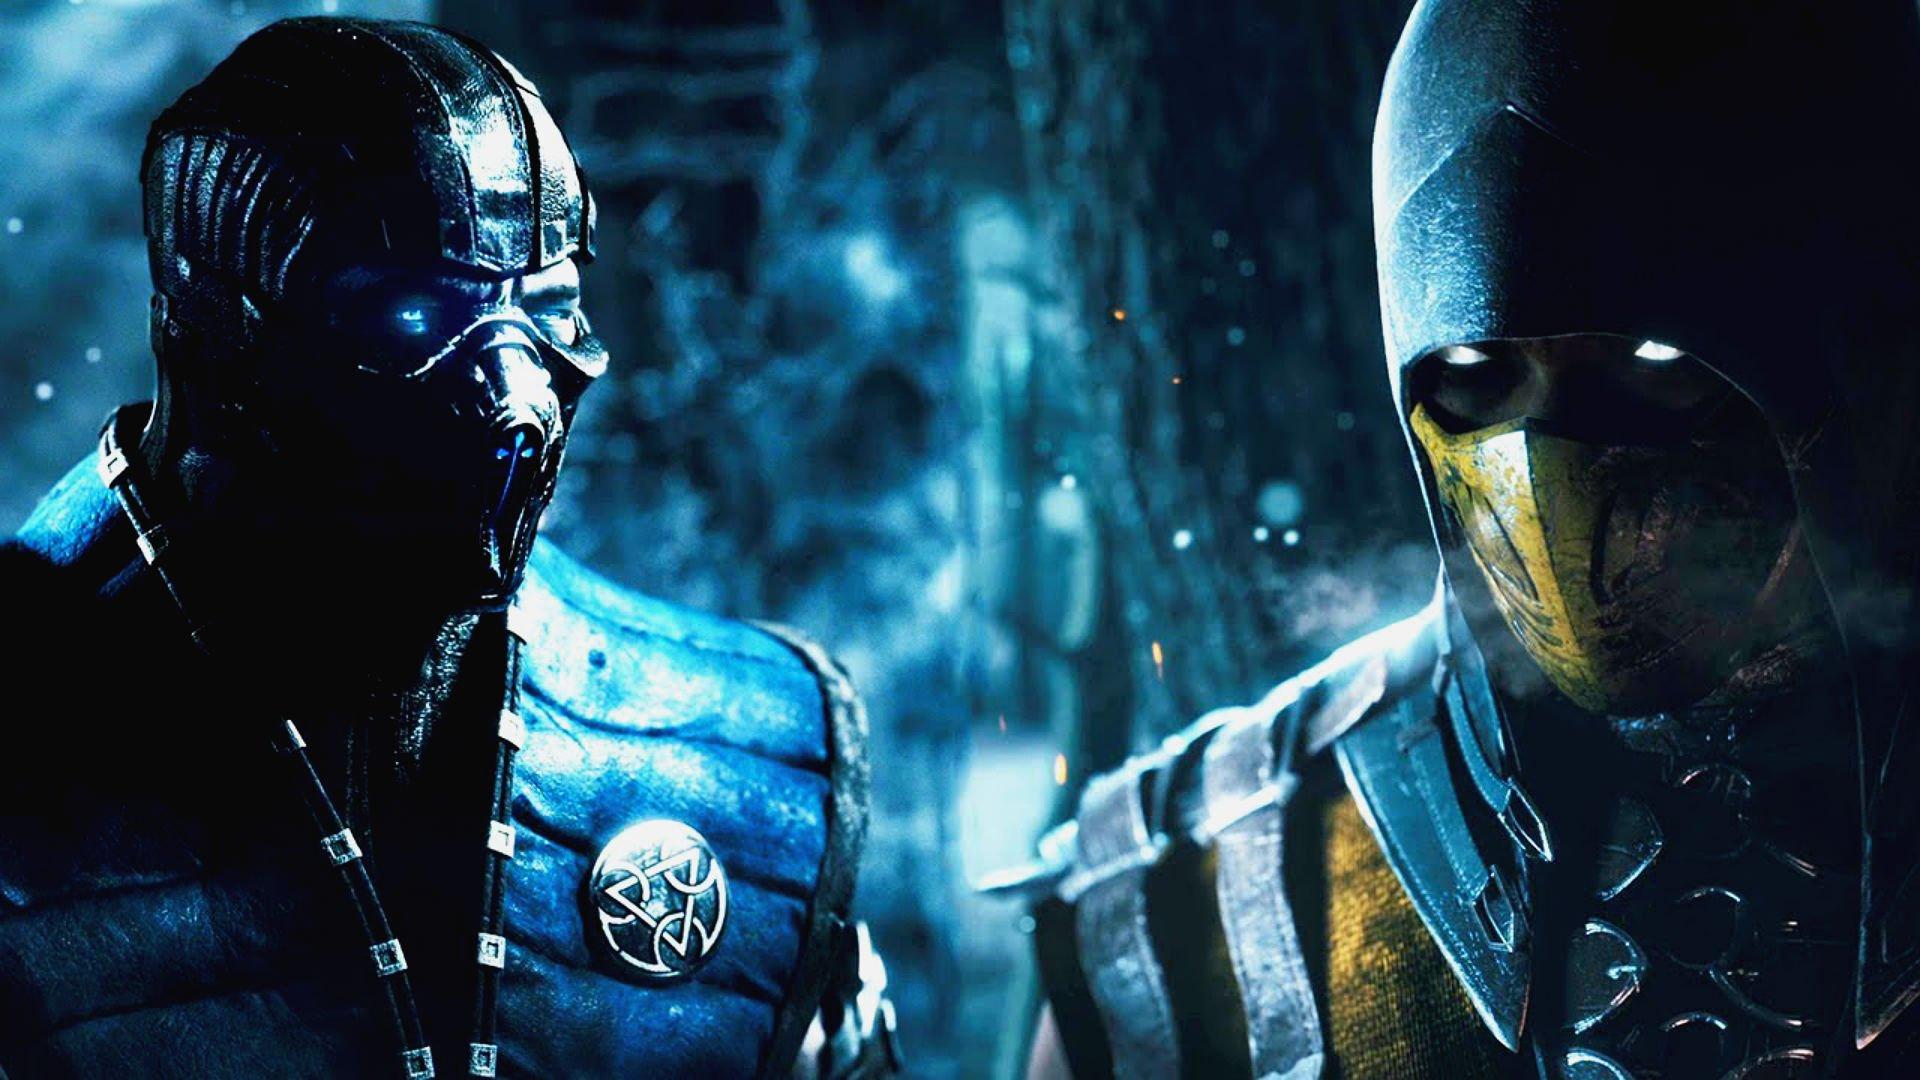 Mortal Kombat X Wallpaper 10